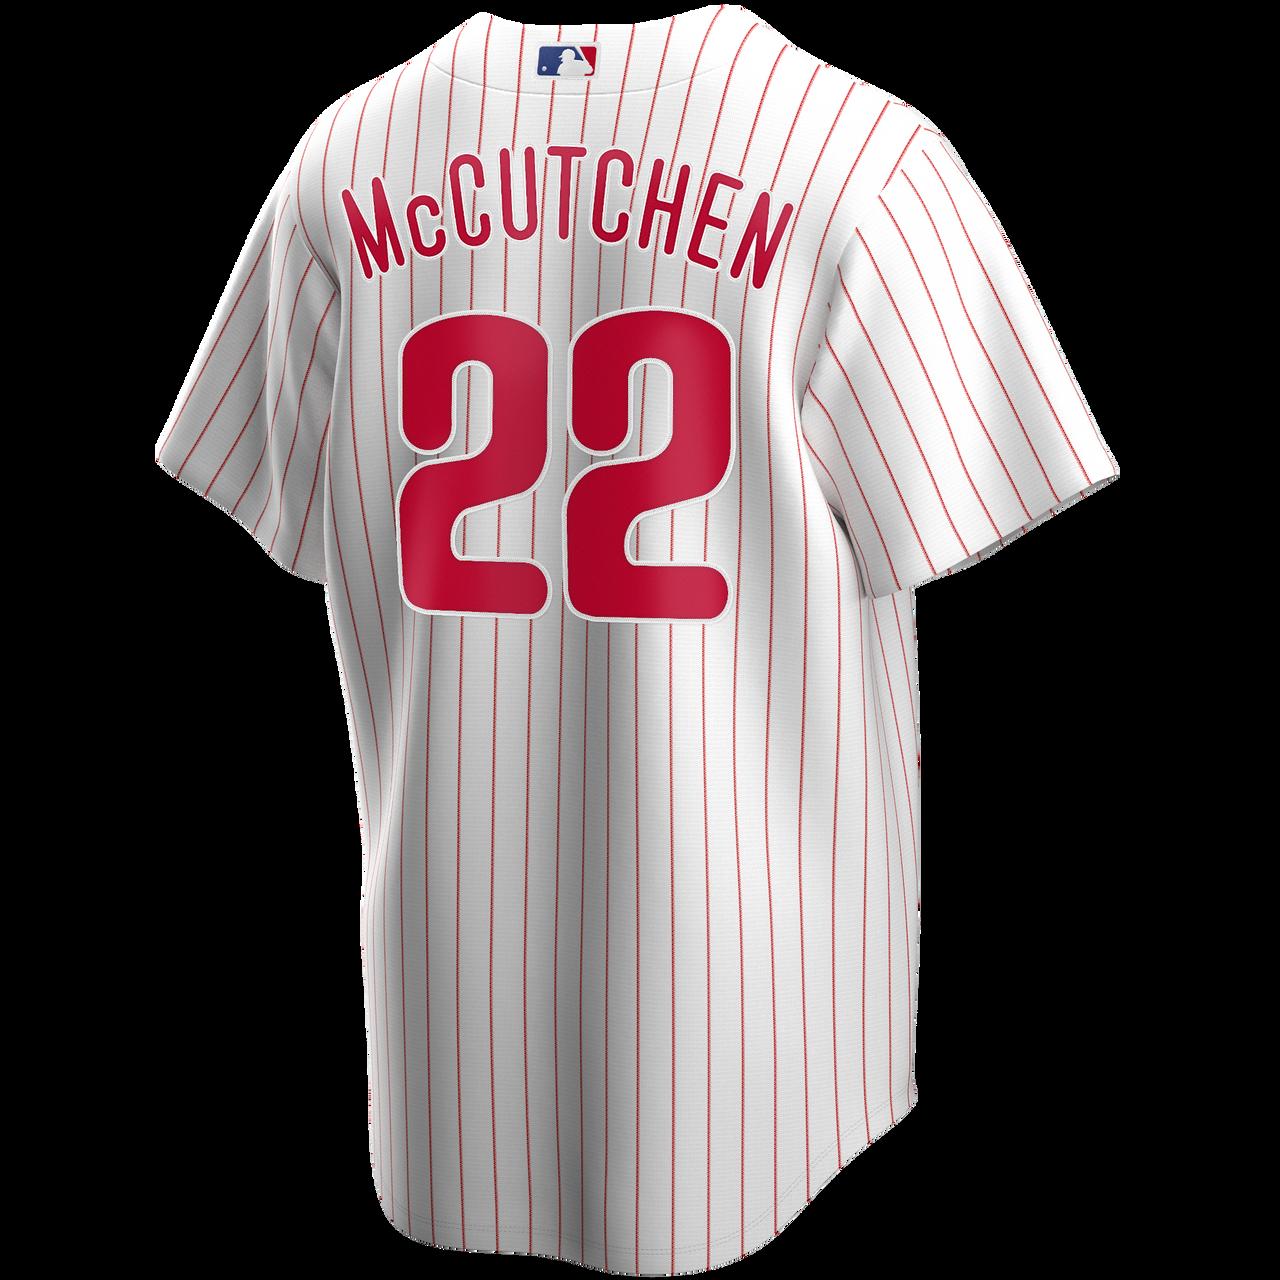 Andrew McCutchen Youth Jersey - Philadelphia Phillies Replica Kids Home Jersey